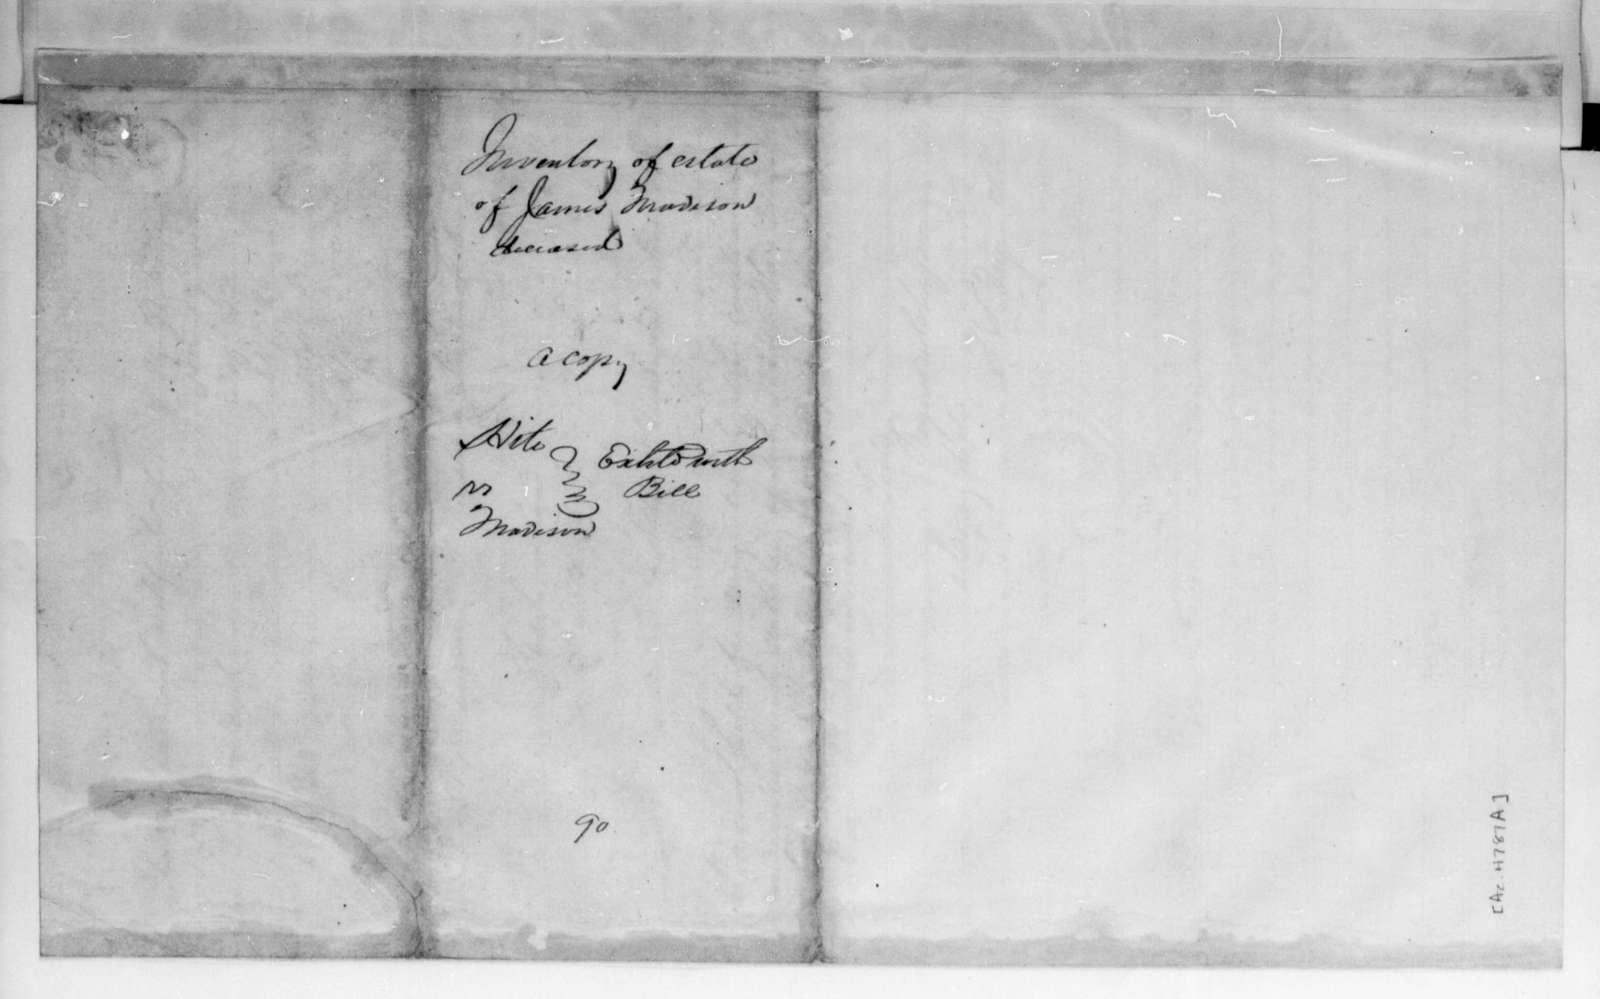 James Madison, September, 1801. Inventory of the estate of James Madison, Sr..